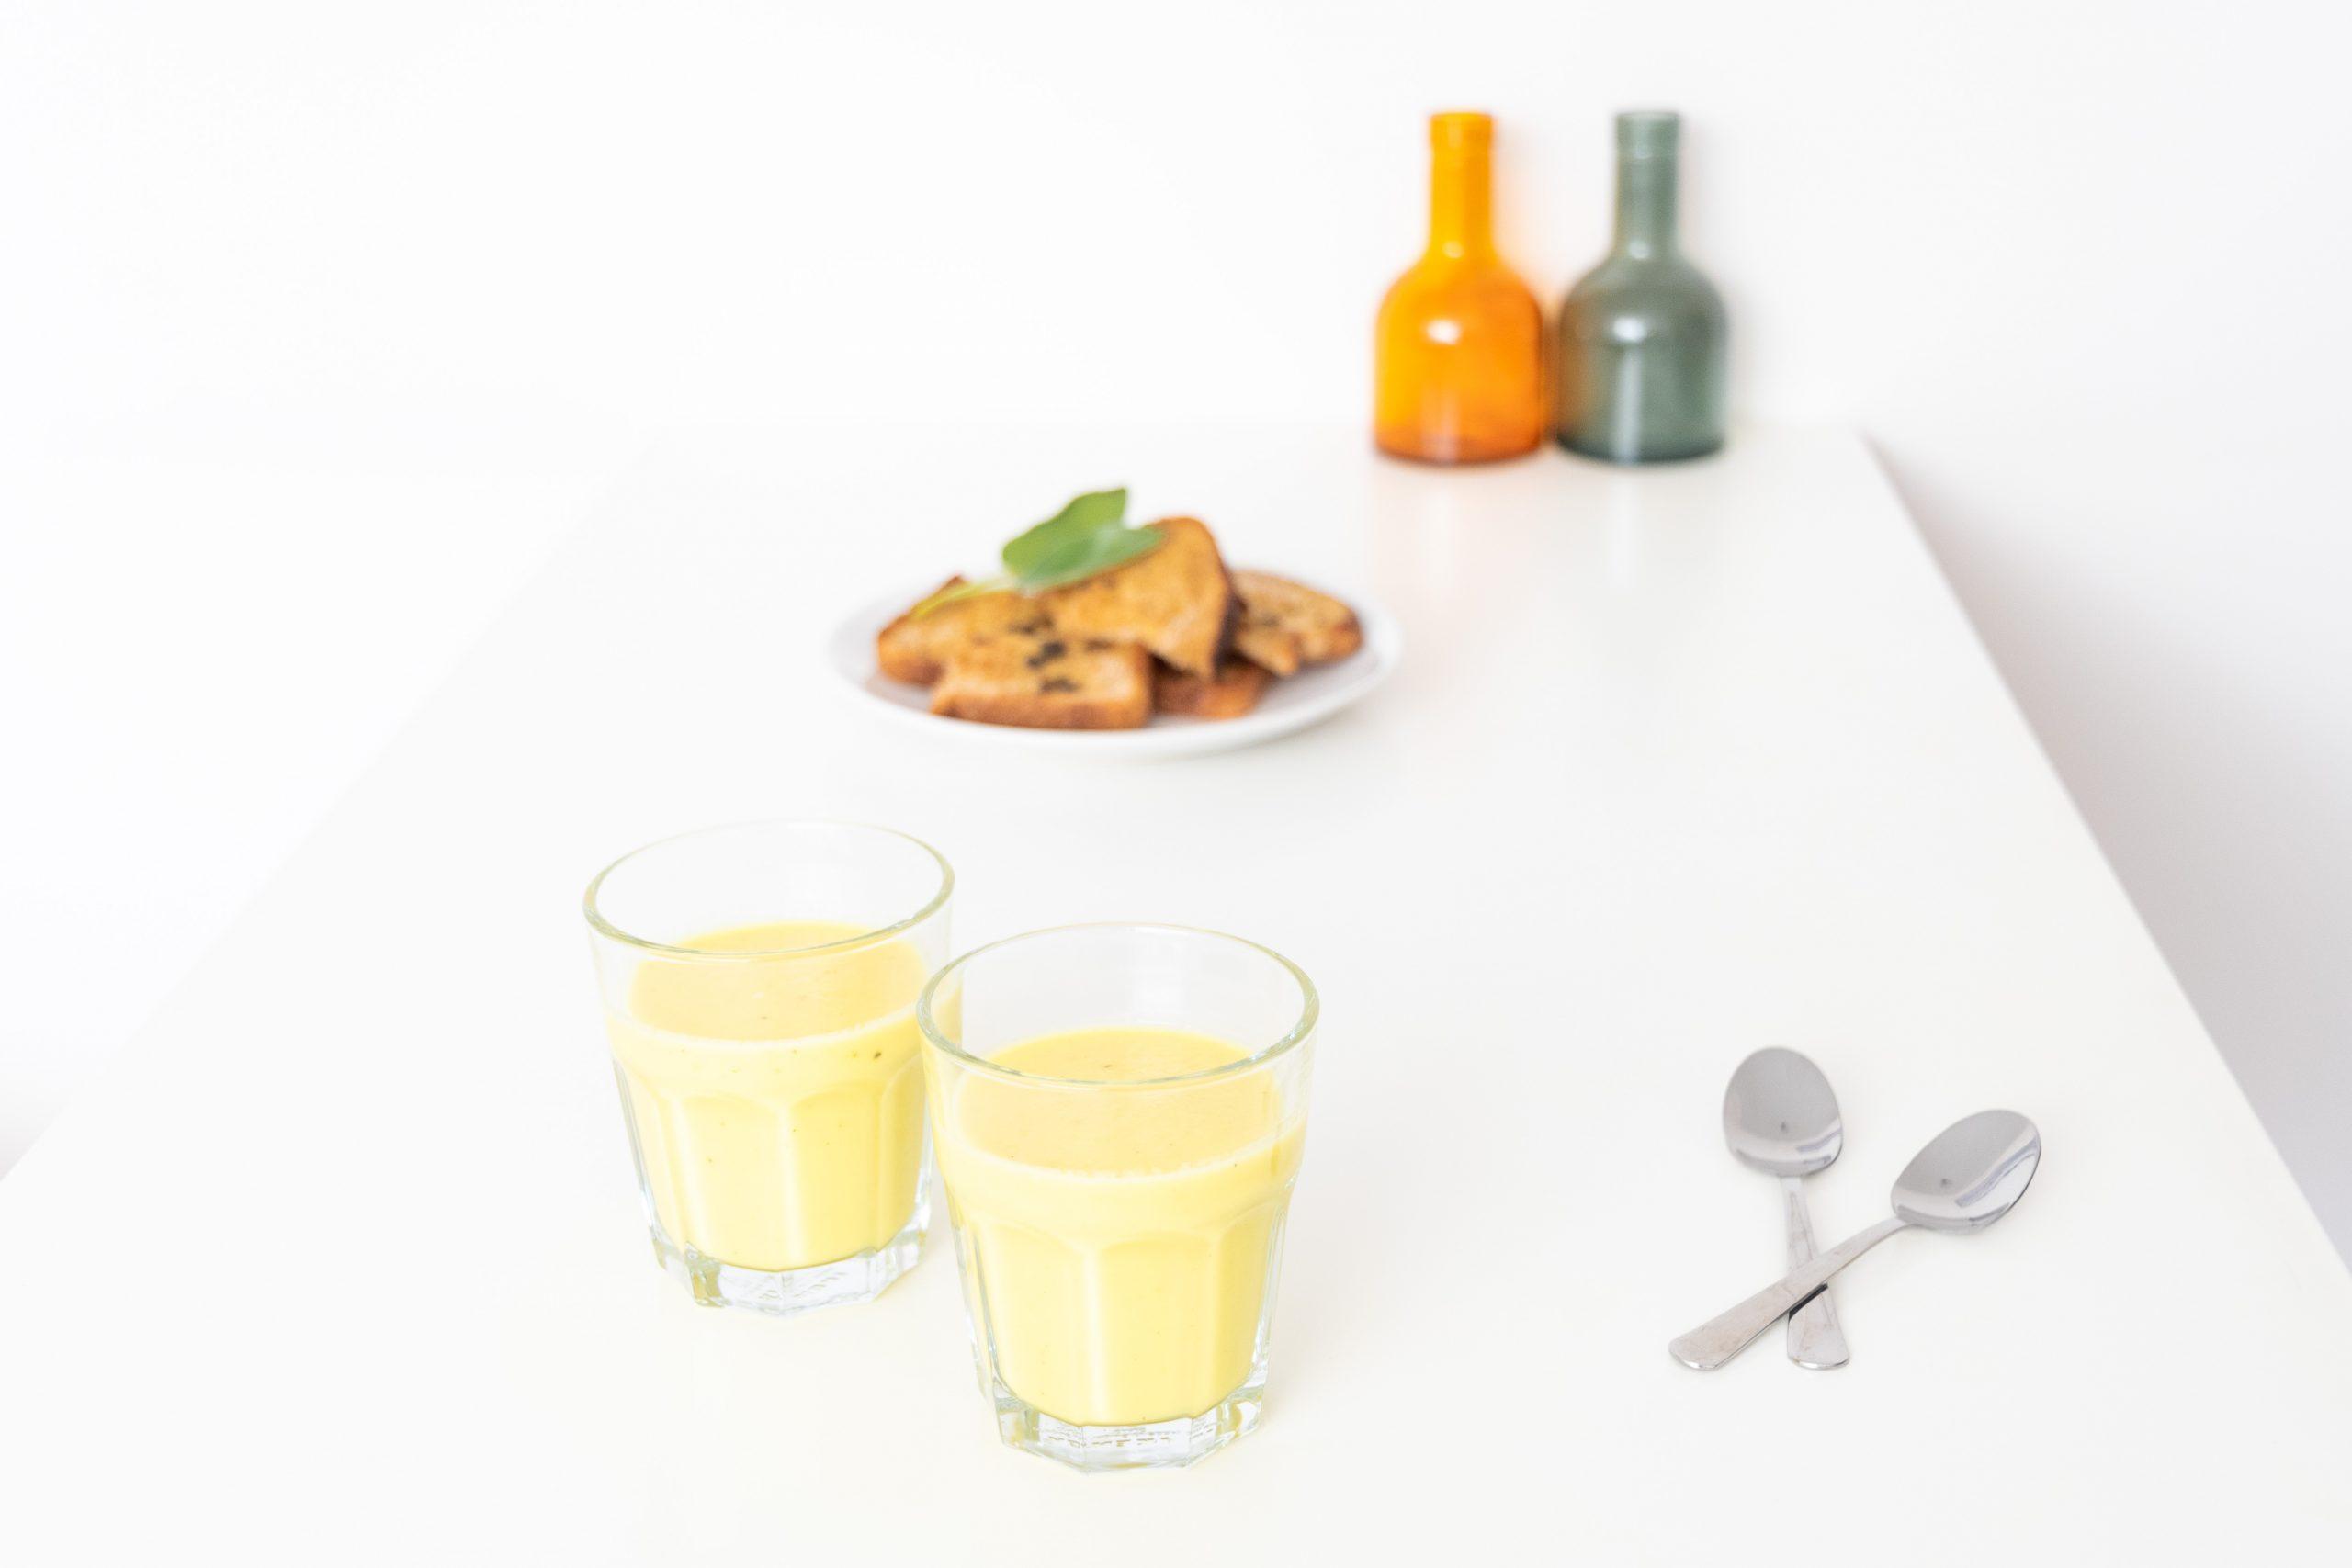 Gelebietensoep met salietoast - Soepiemonster